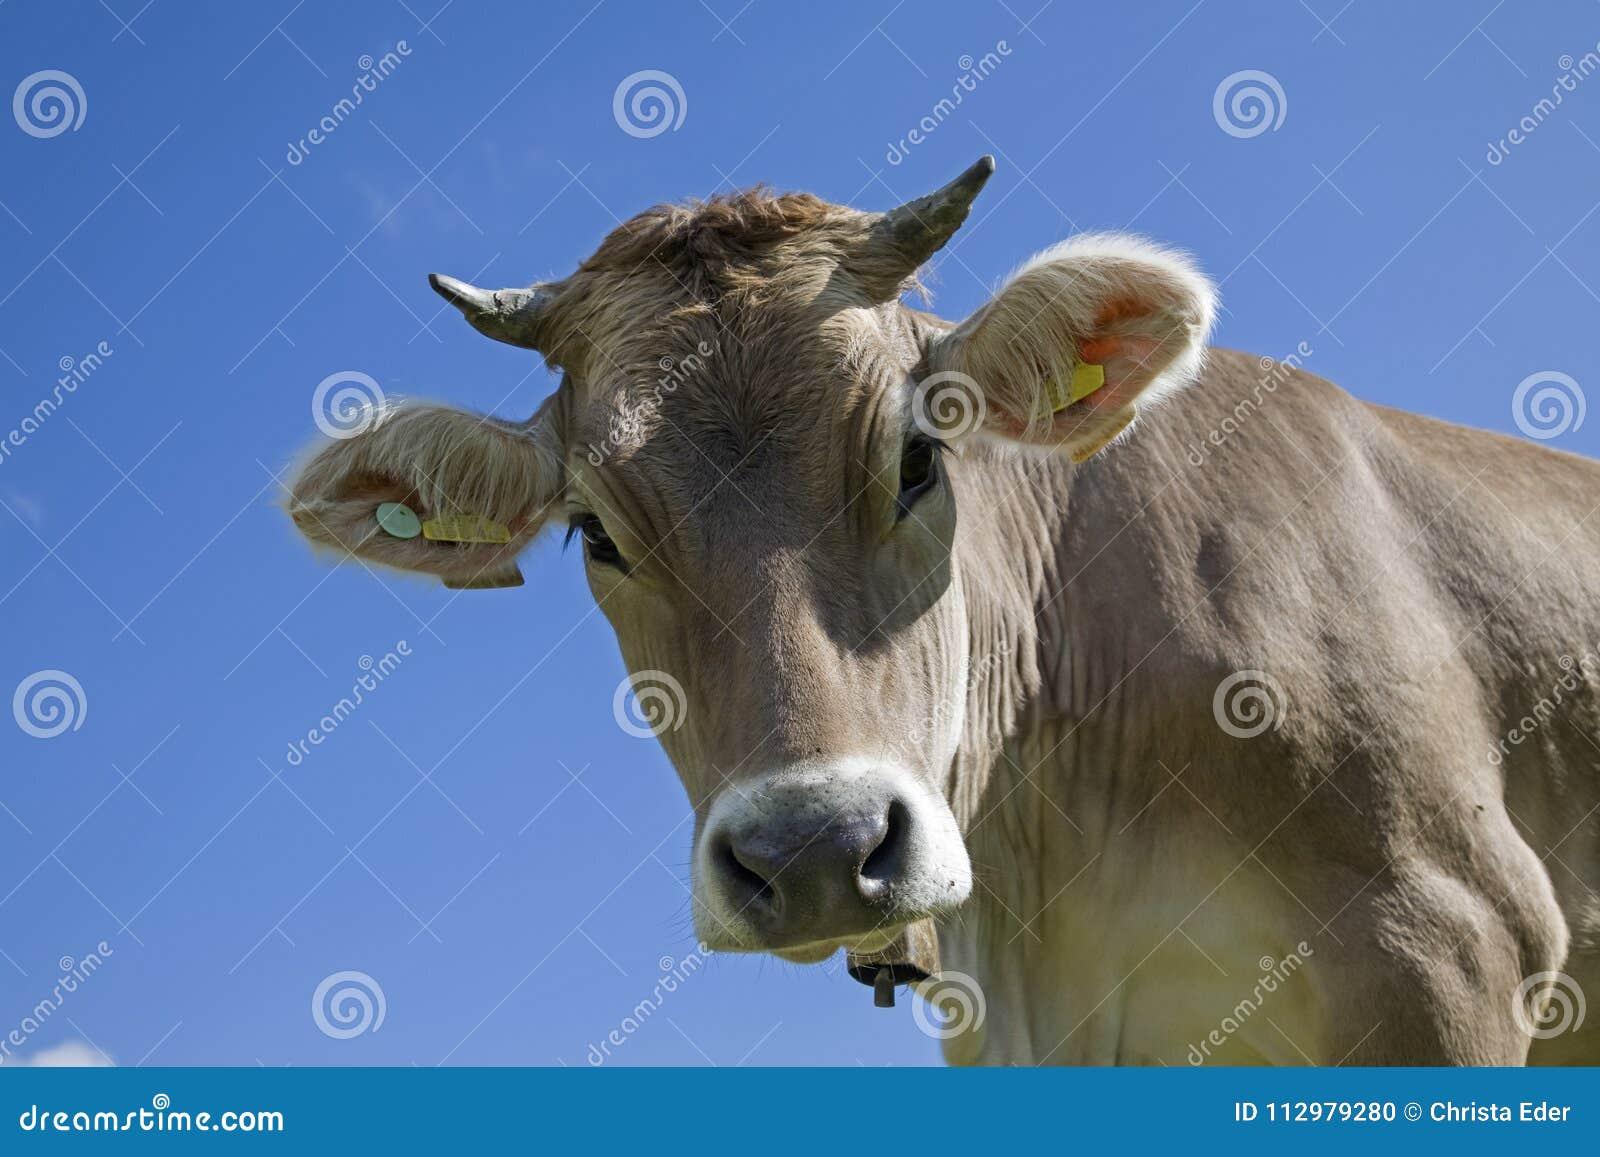 Portrait of a cow against blue sky